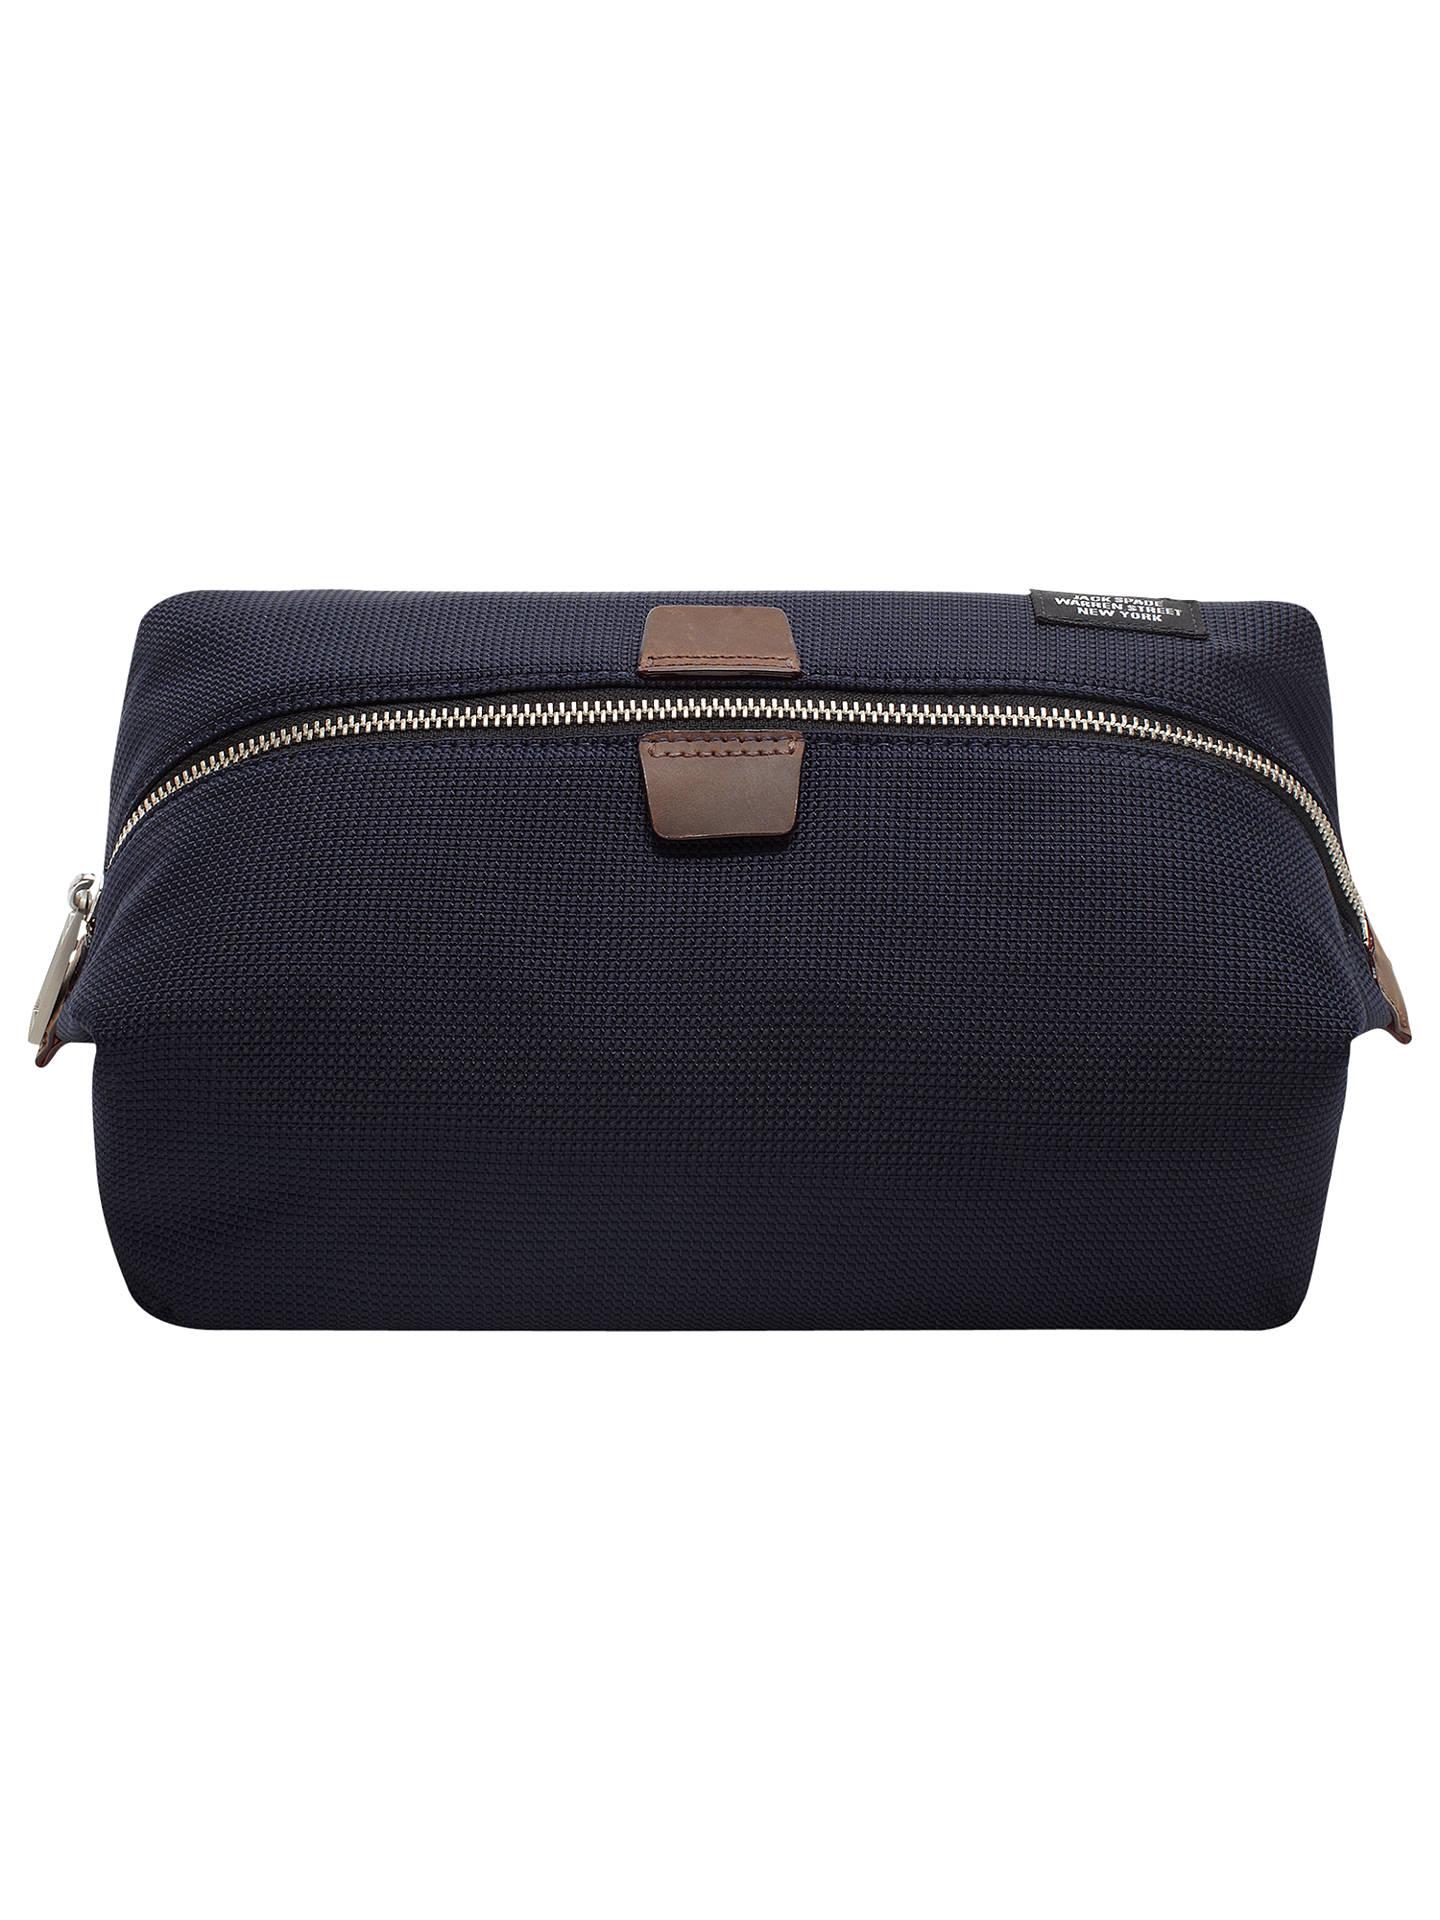 3a9f35ebccc6 BuyJack Spade Nylon Wash Bag